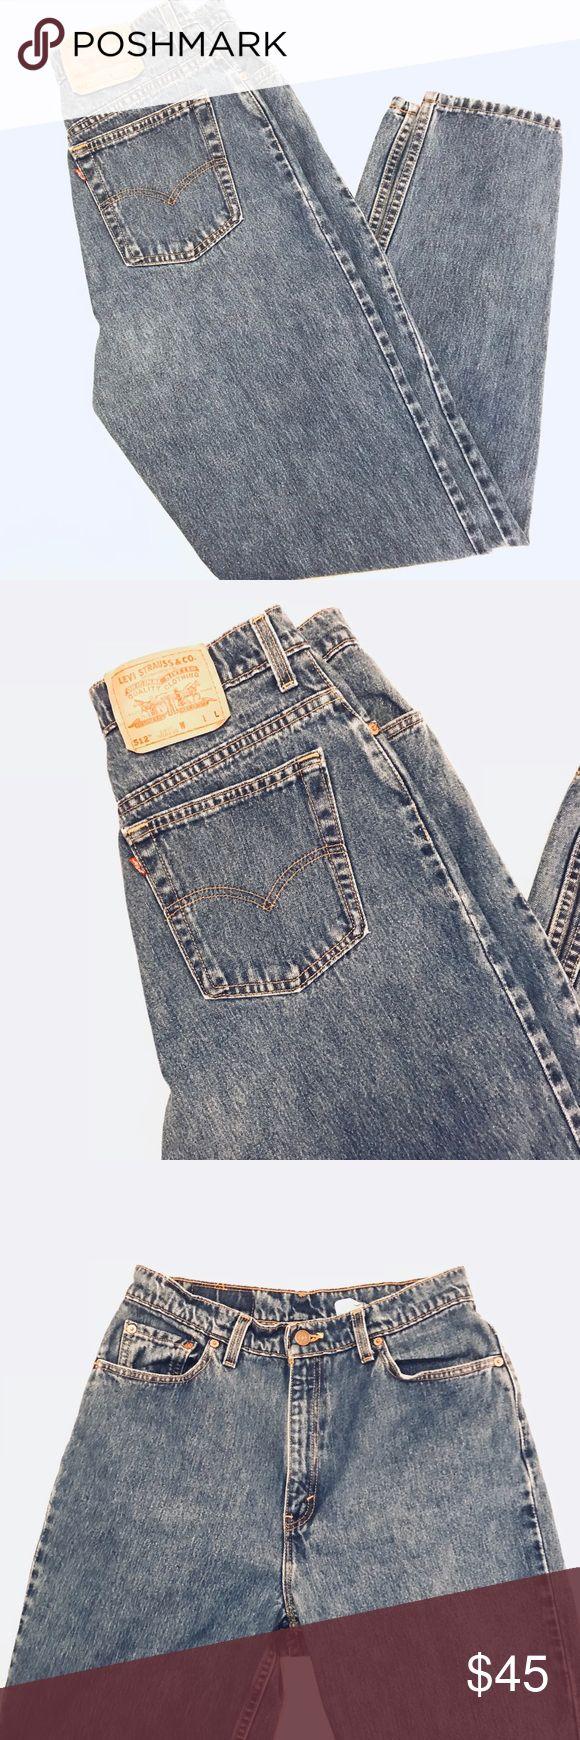 512 Vintage Levi Jeans High Waist Jeans Womens Levi 512 Vintage  High Waist Jeans Womens  Medium Distressed Denim  Slim Fit Taper Leg Levi  Size 14 L slim fit Levi's Jeans